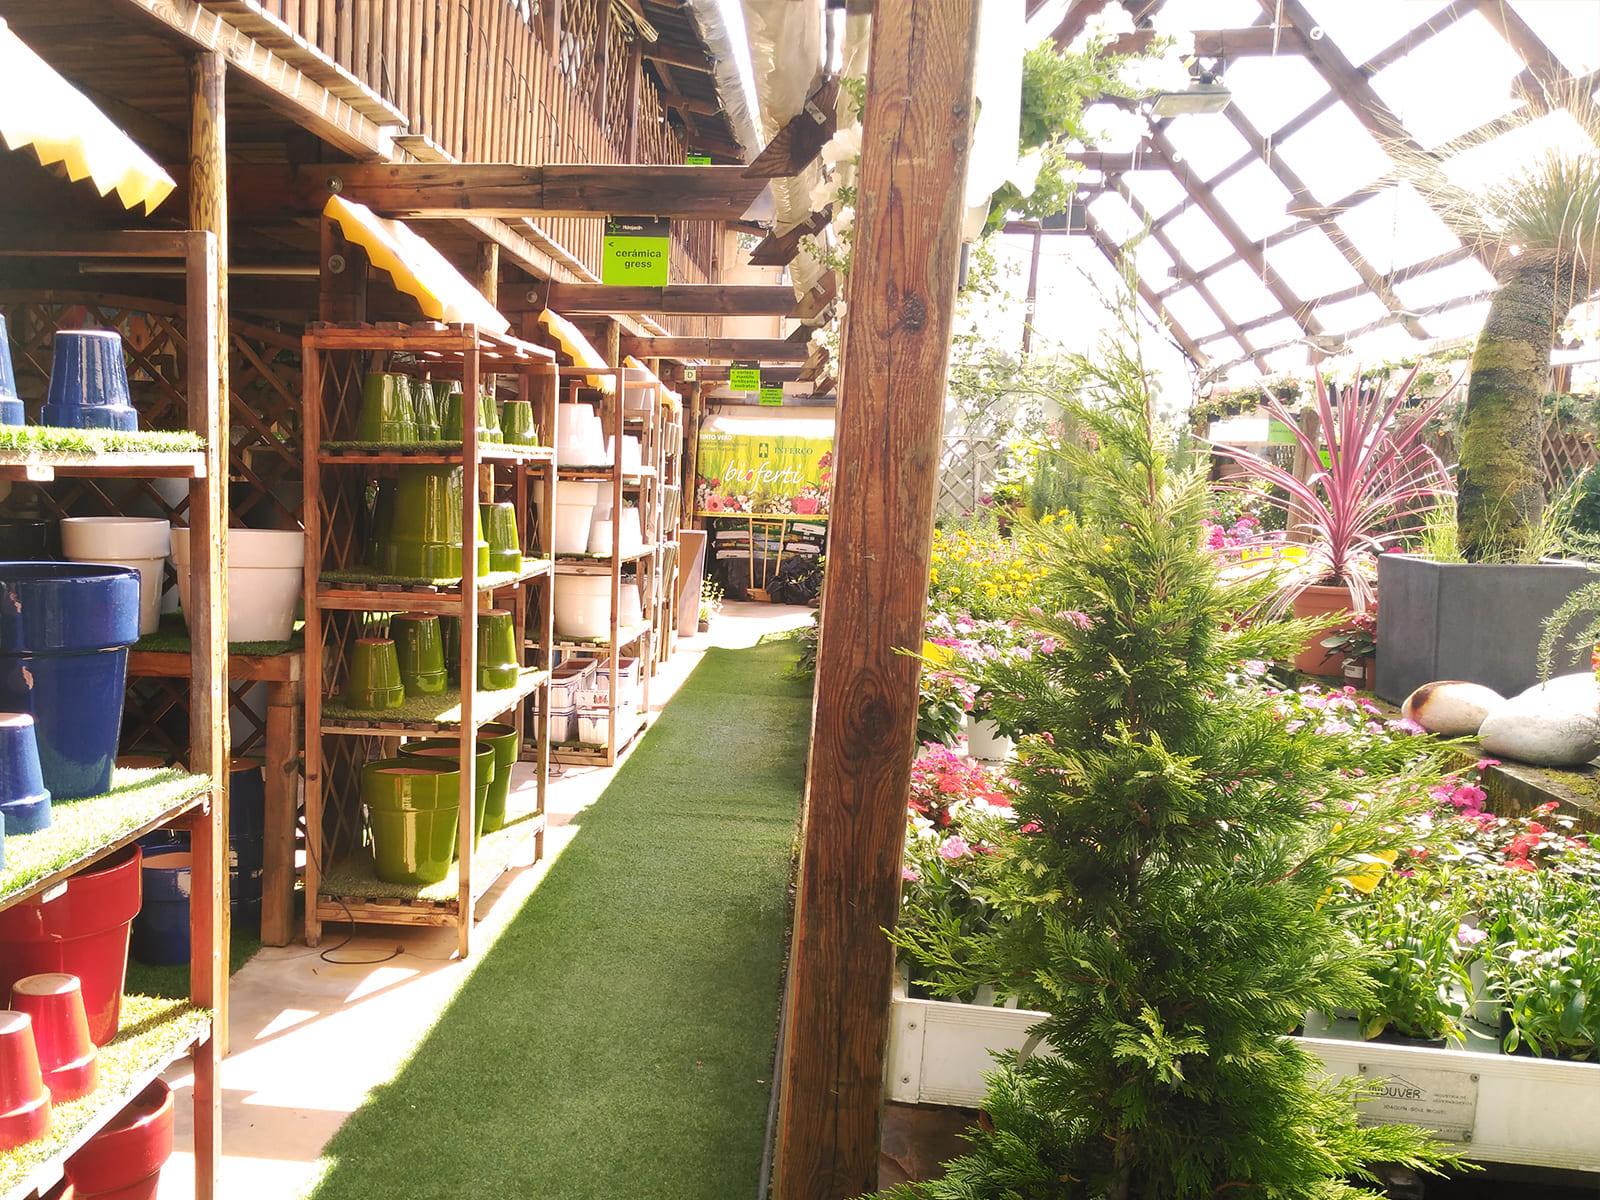 centro-jardineria-garden-invernadero-artesanal-madera-fuente-10_HIDROJARDIN-Bañeres